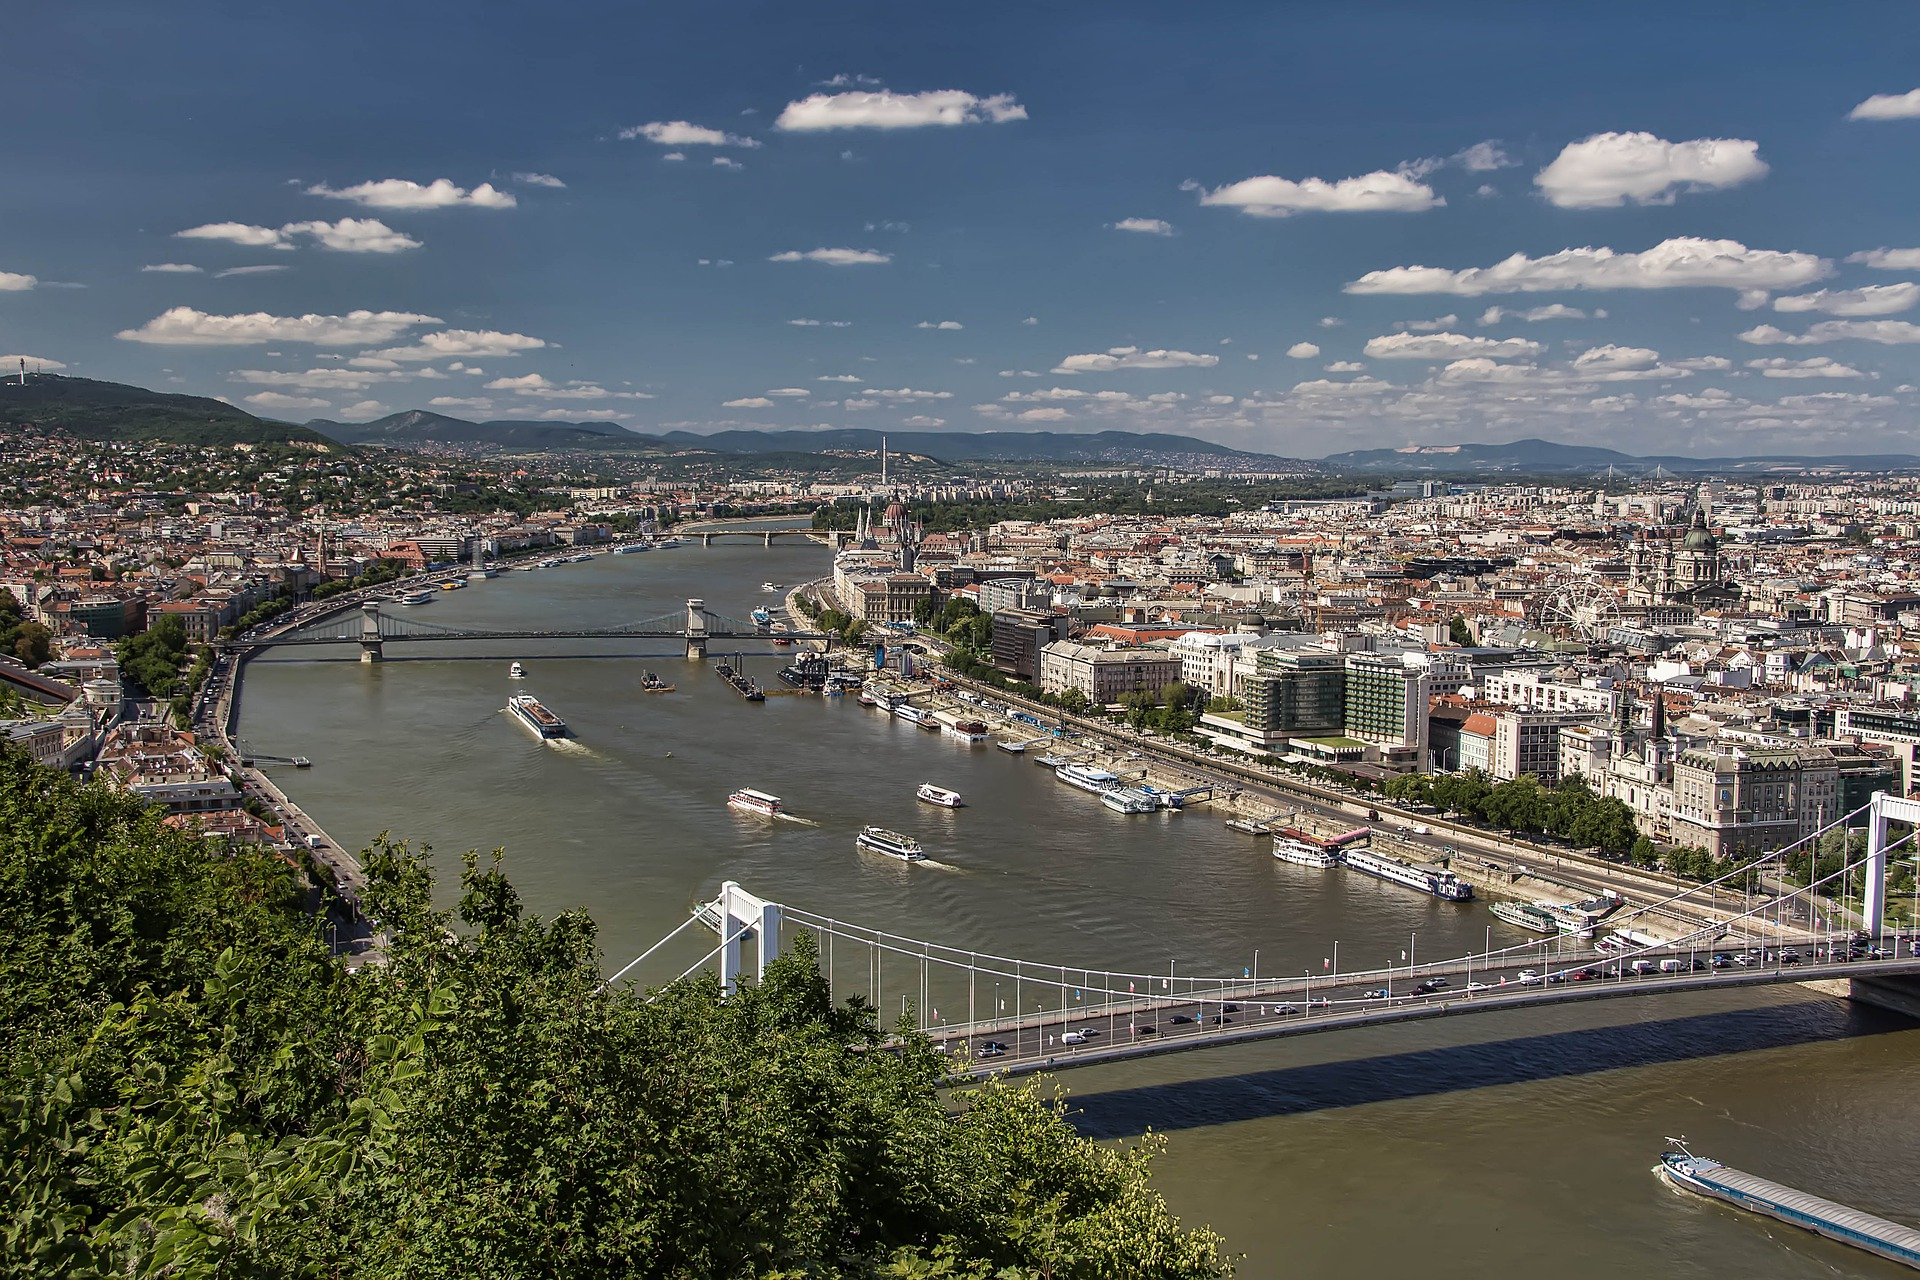 budapest-3110288_1920